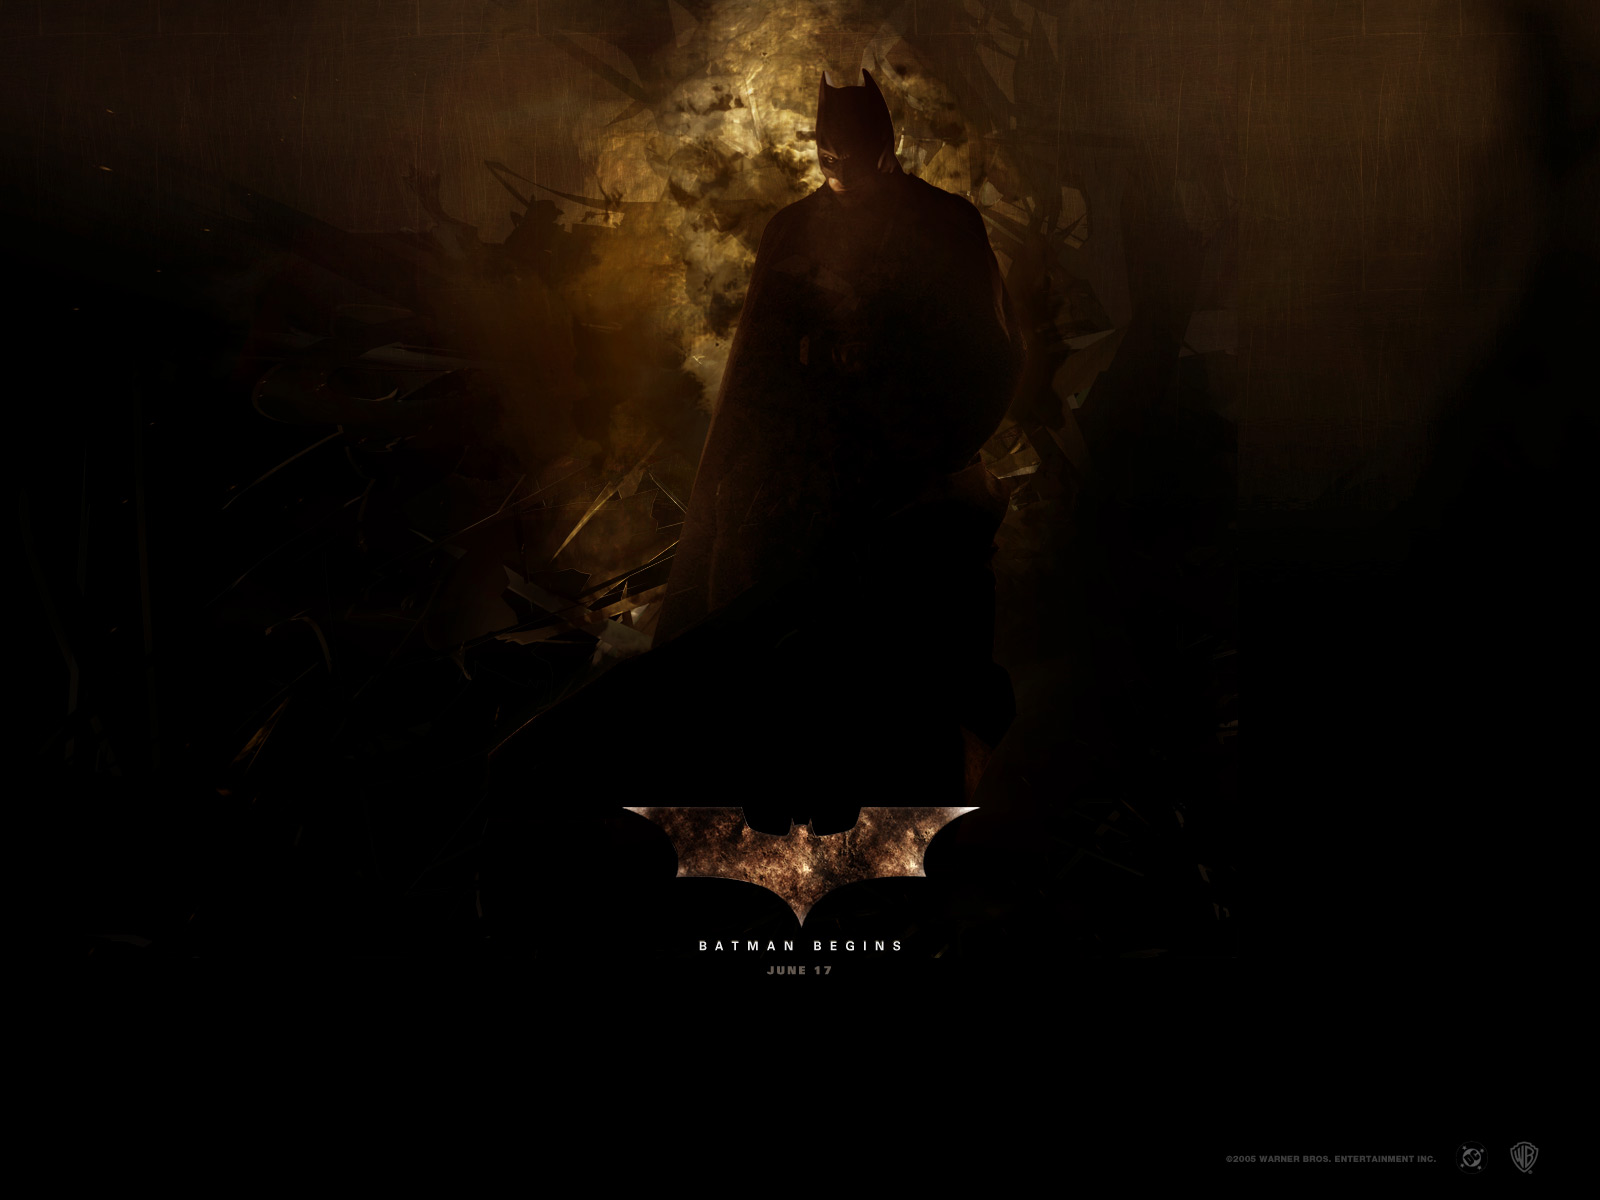 Fond d 39 ecran batman photos 330 wallpaper - Telecharger batman begins ...